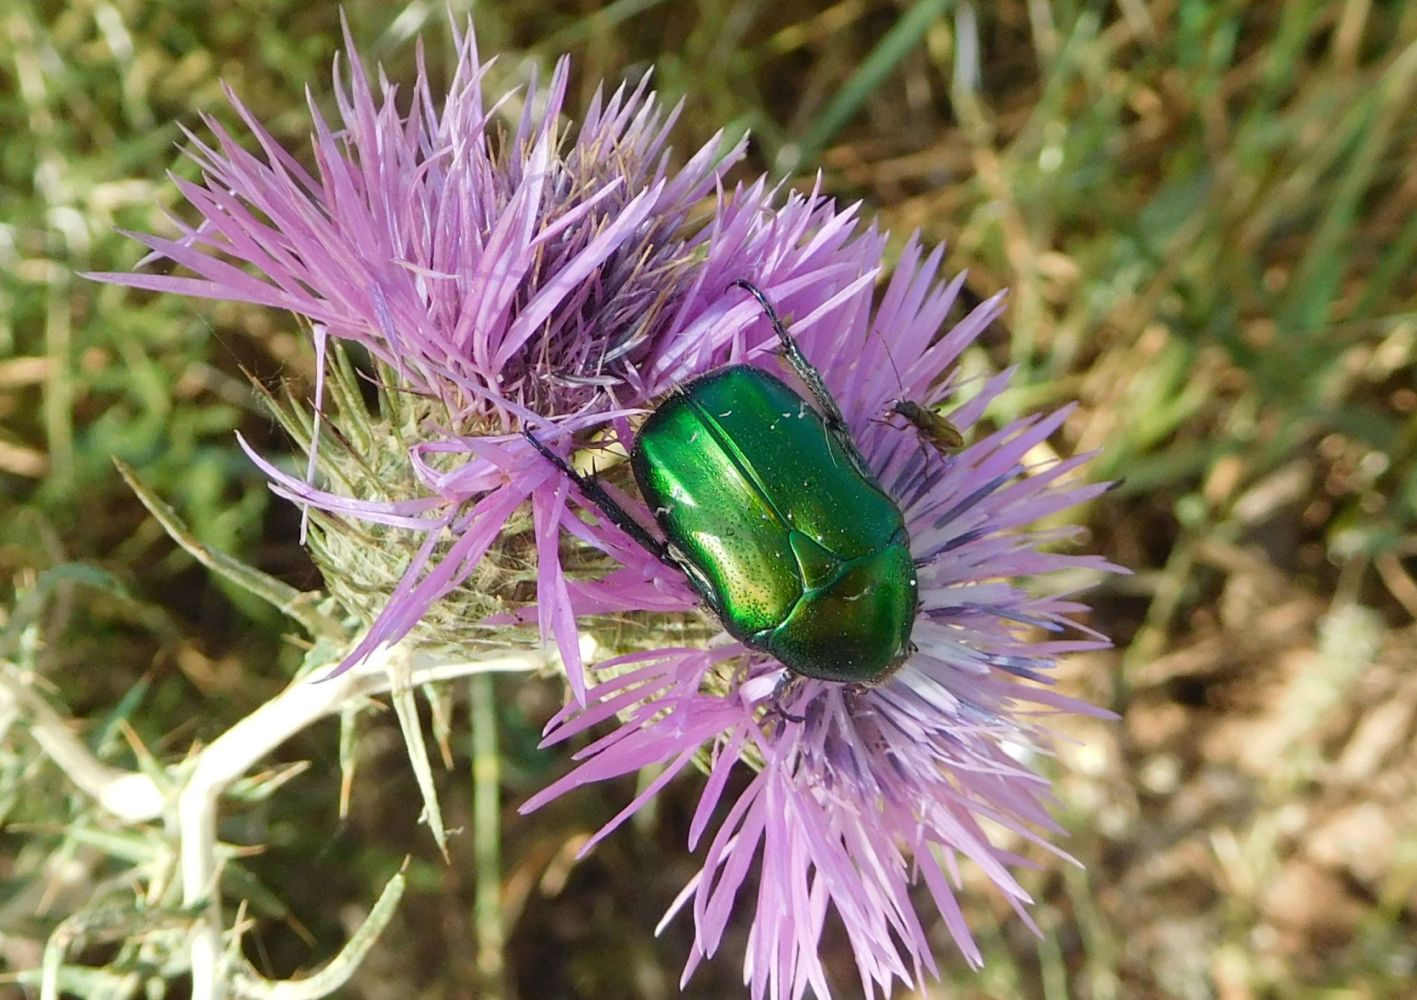 Chrysomelidae (?):  No. Cetoniidae, Cetonia aurata pisana